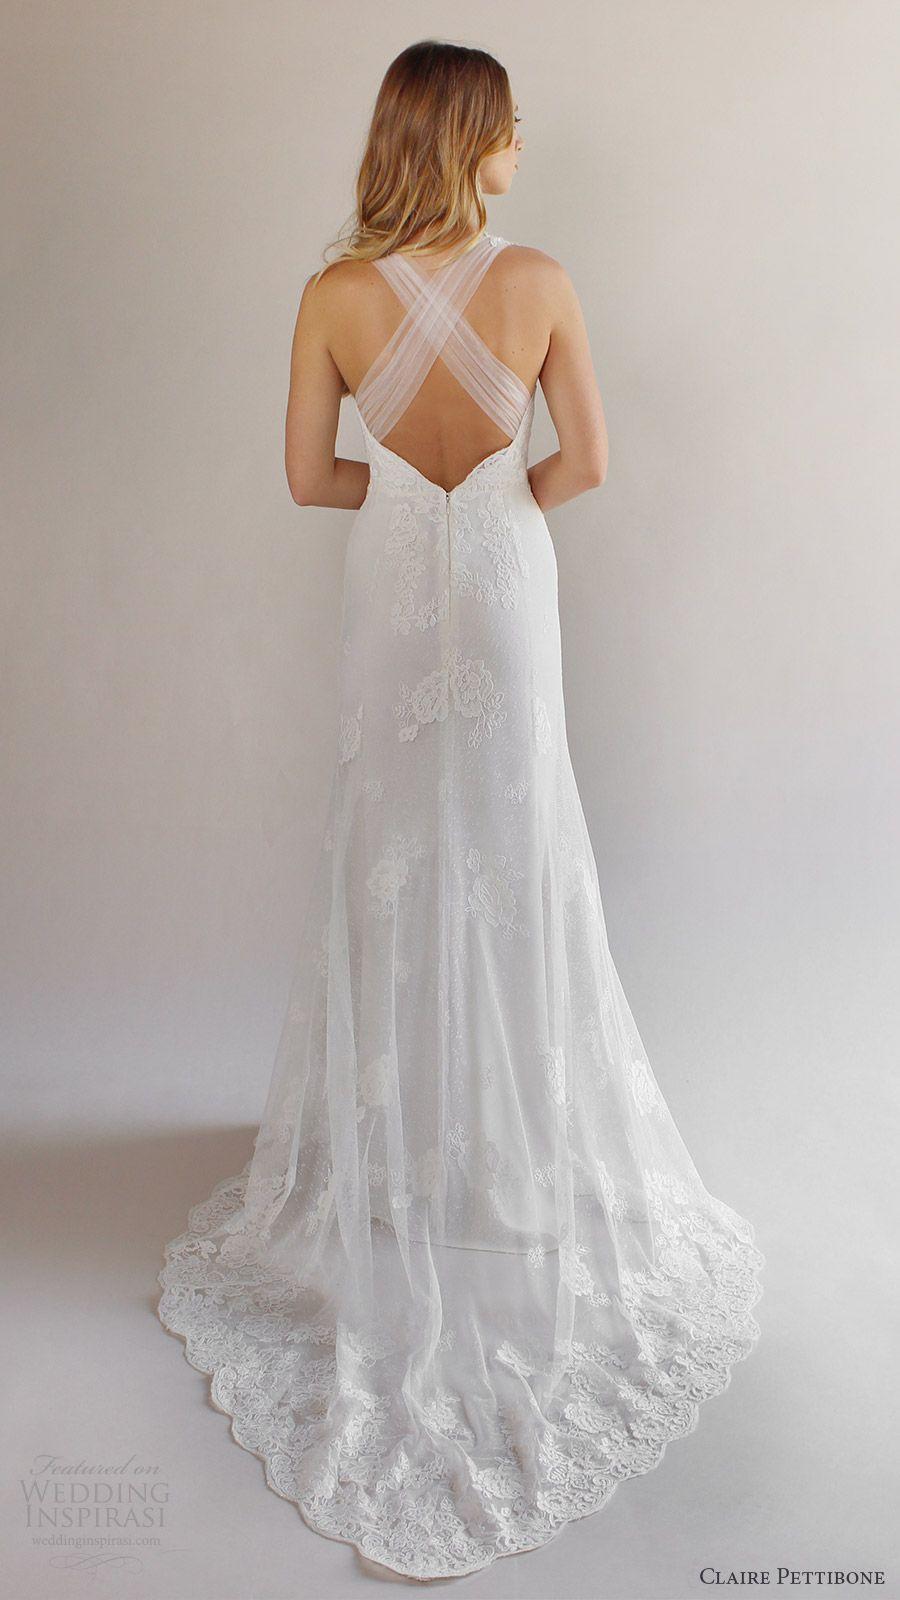 Romantique by claire pettibone spring wedding dresses